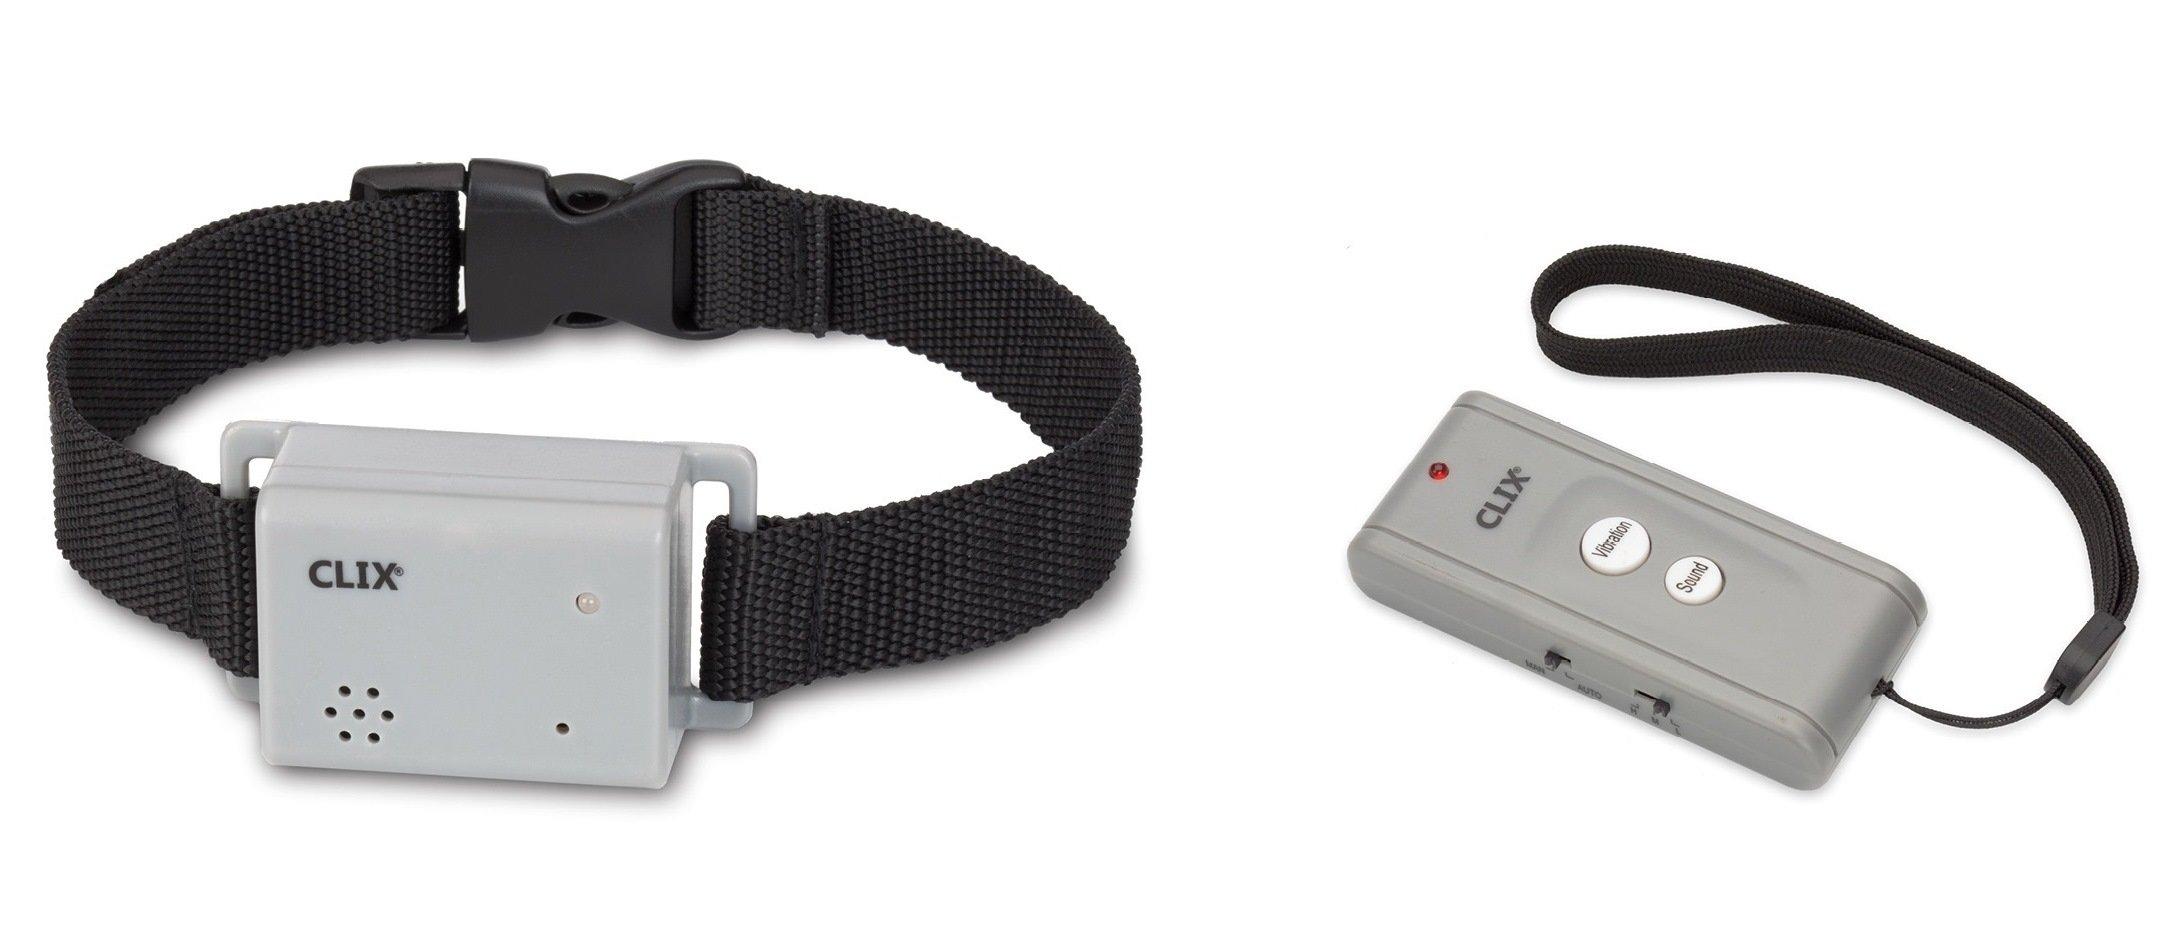 Clix Remote Control Dog Collar Trainer, No Bark Collar, Control Unwanted Behaviour (Vibration or Sound)